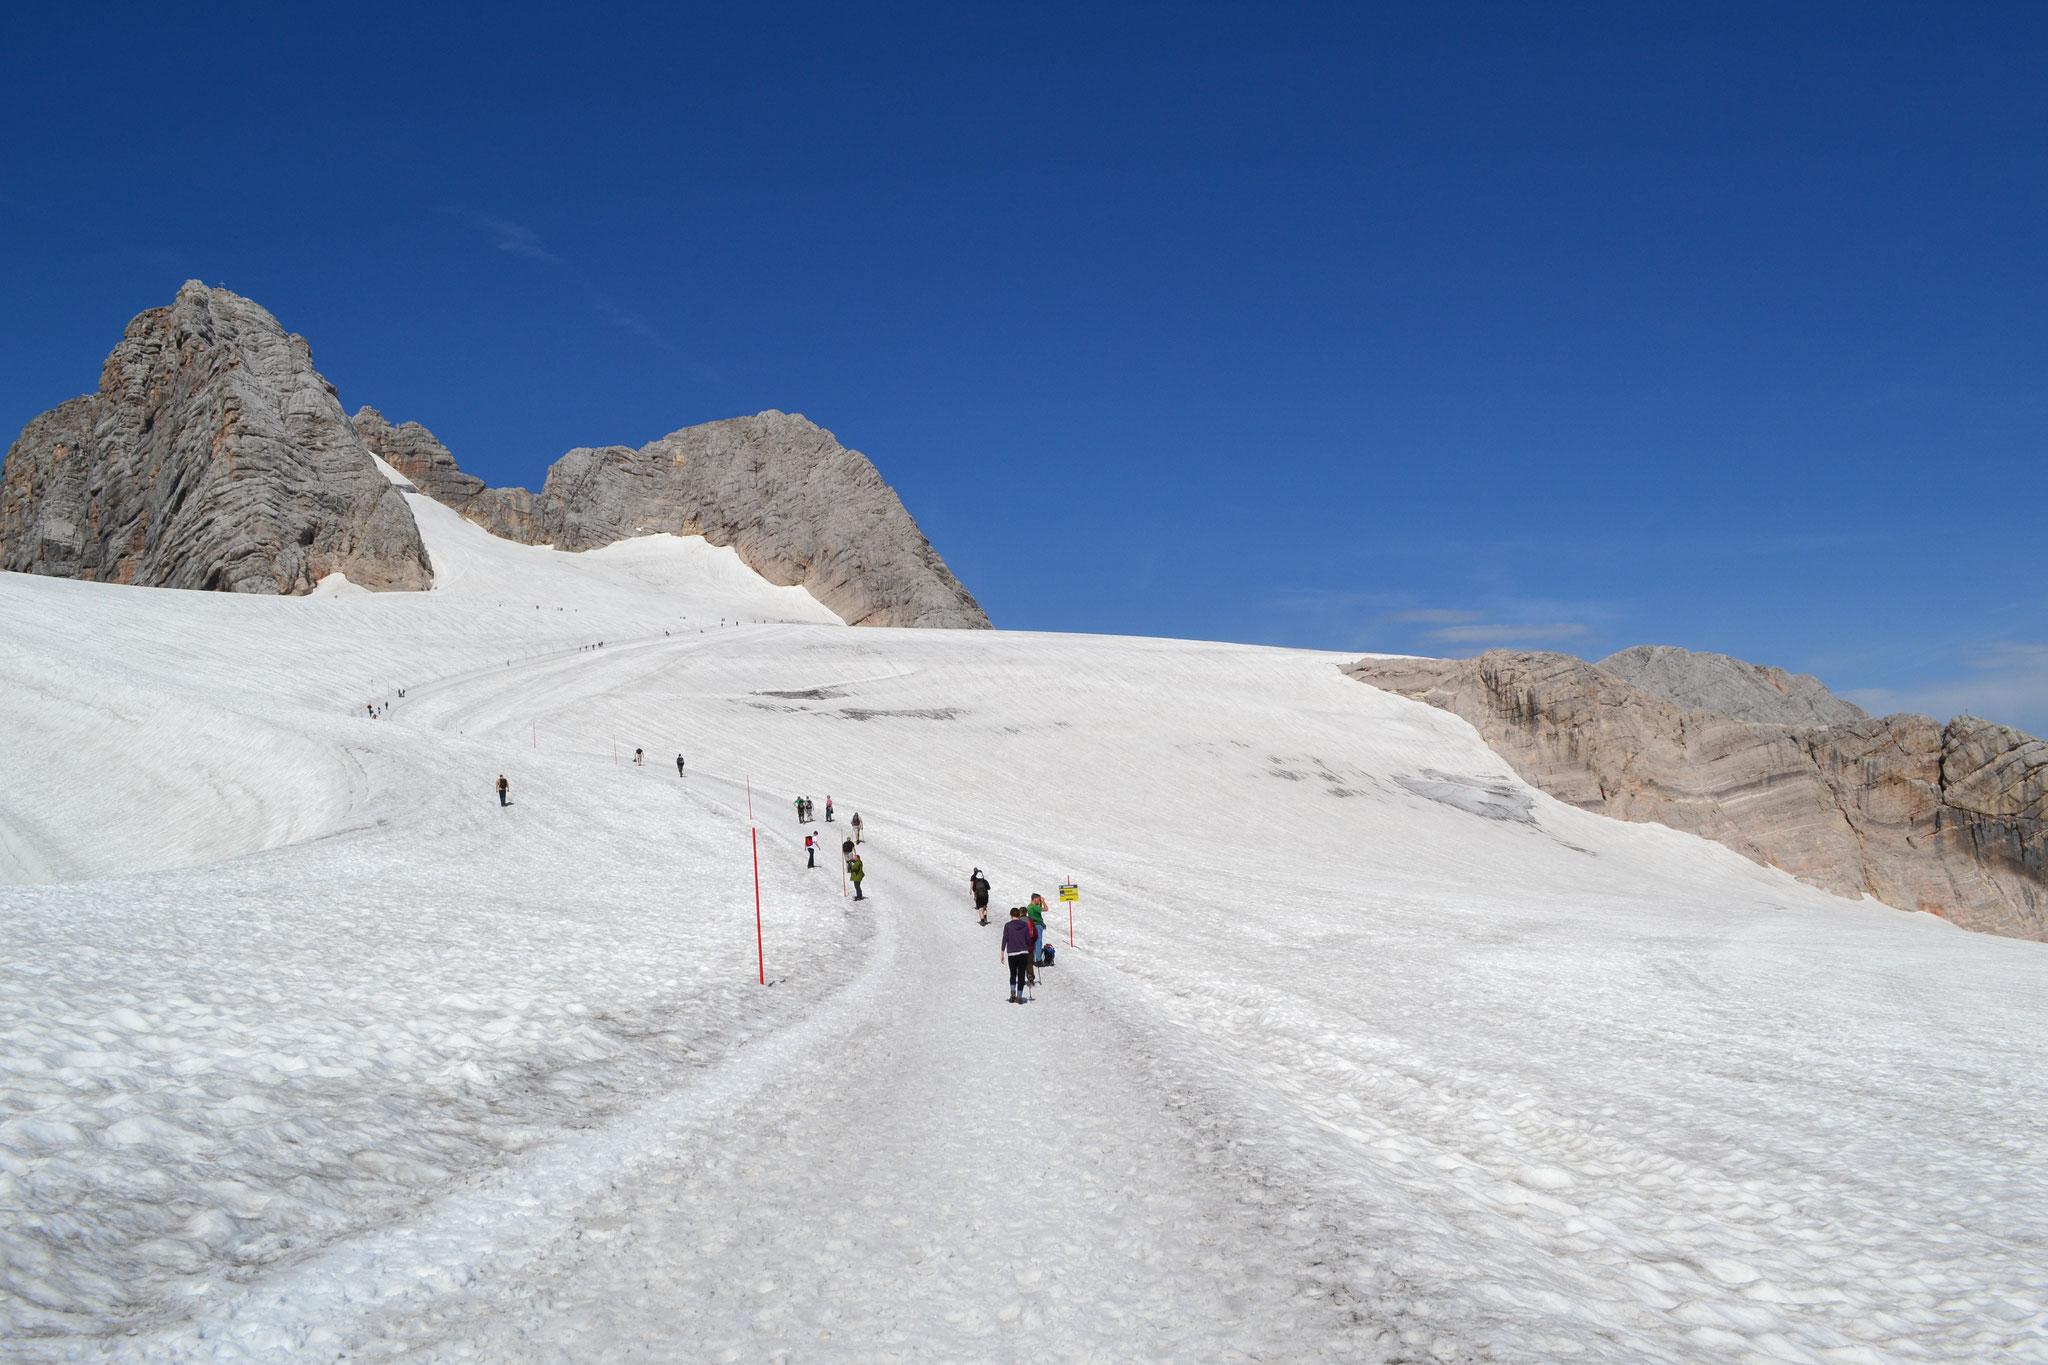 Hiking path on the glacier